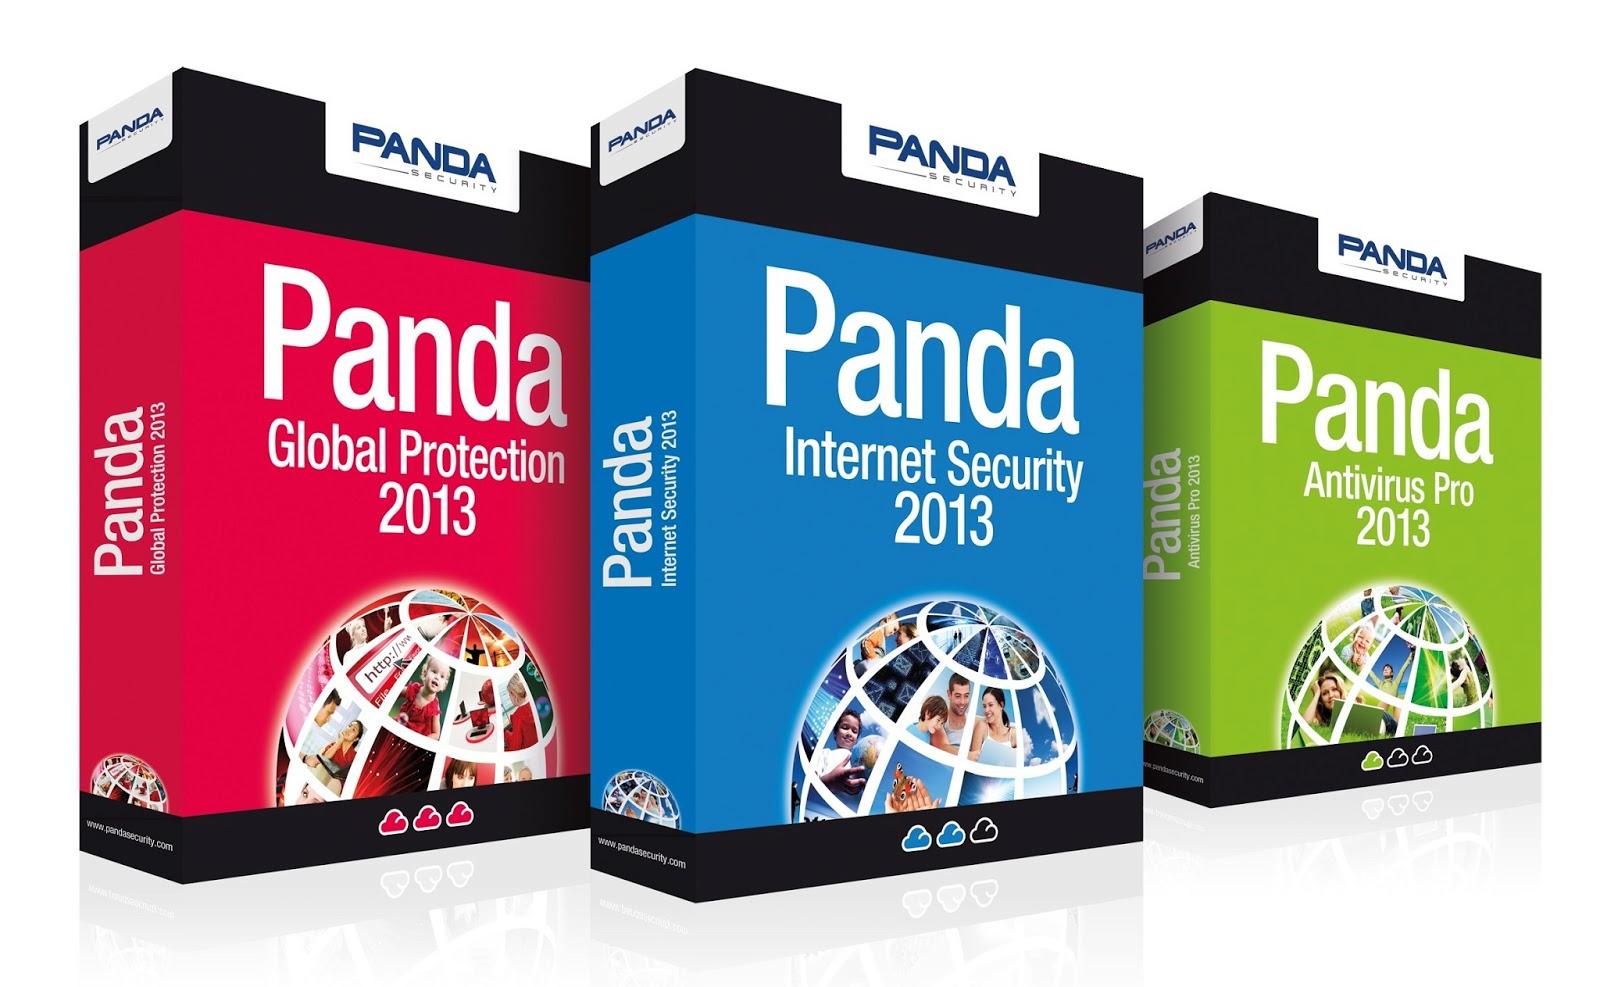 Panda Antivirus free download 2013